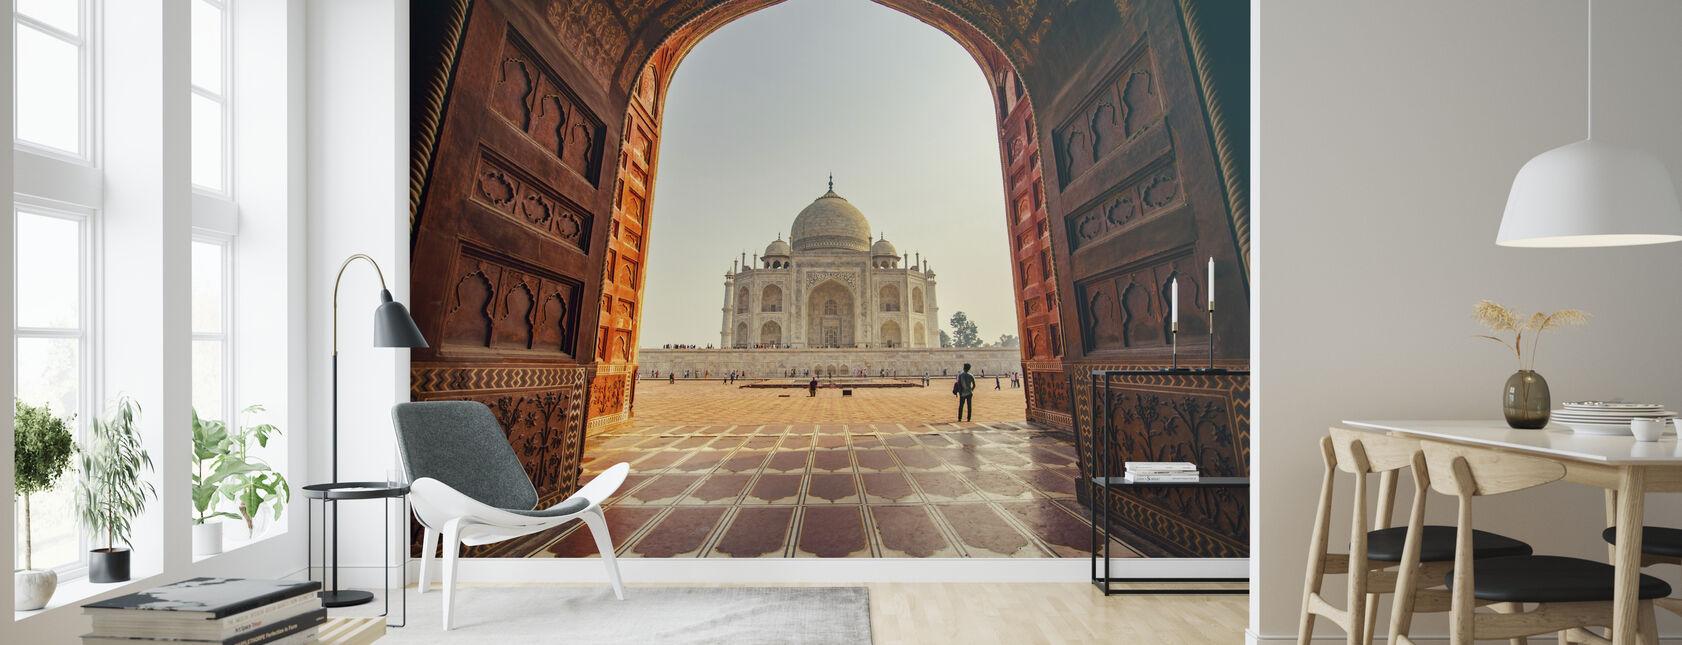 Taj Mahal - Wallpaper - Living Room